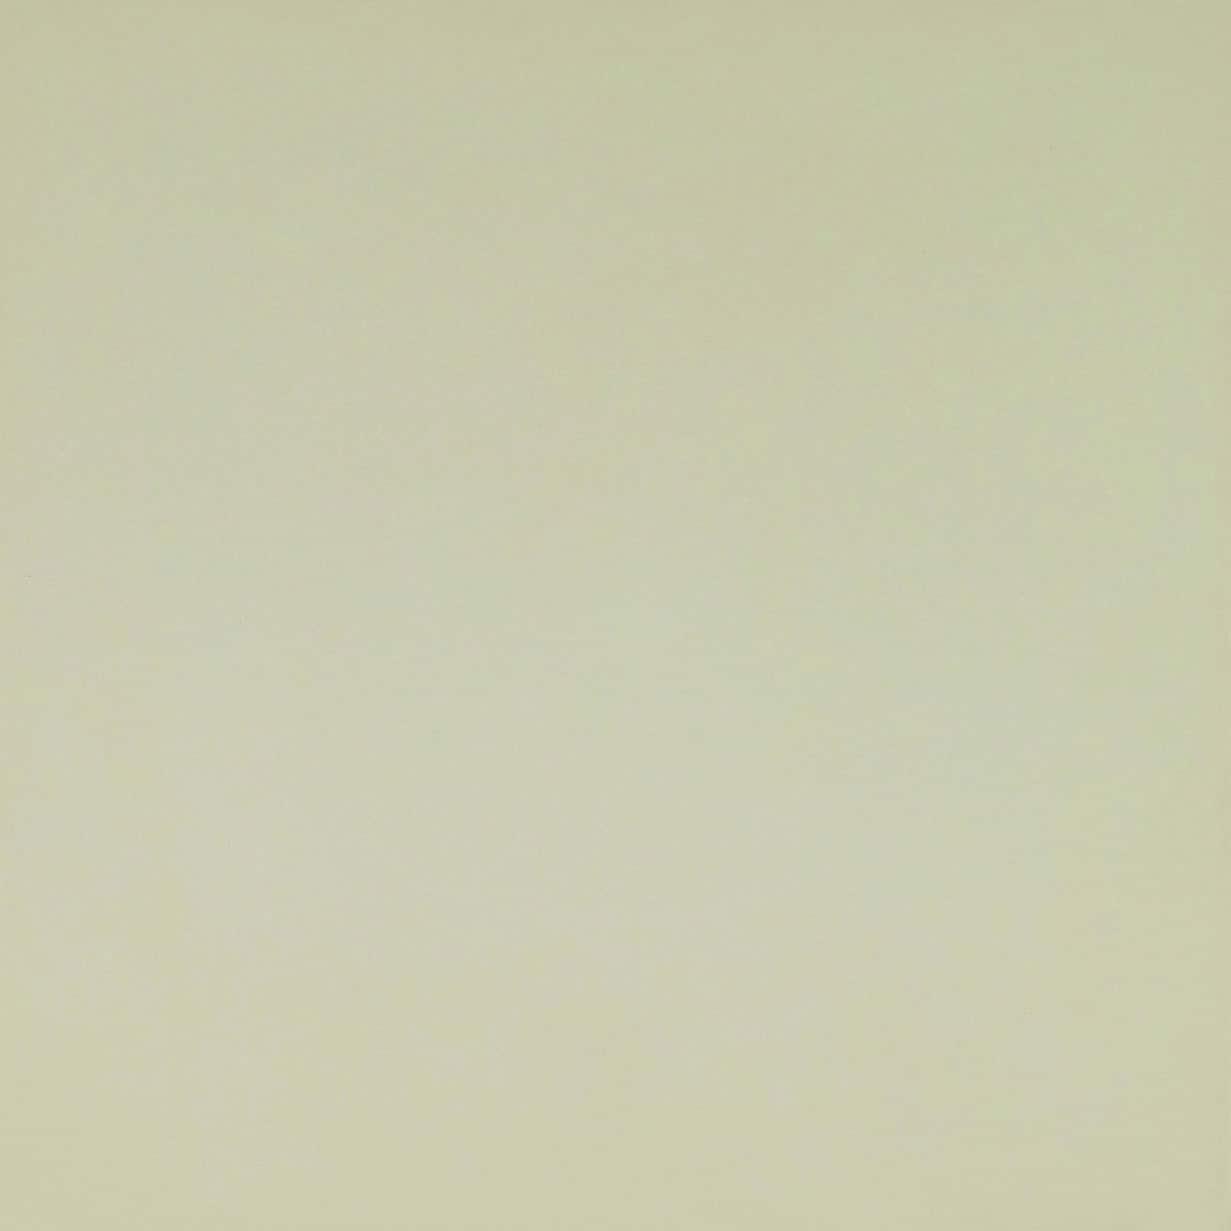 60T002A-Olympus-Pearl-White.jpeg